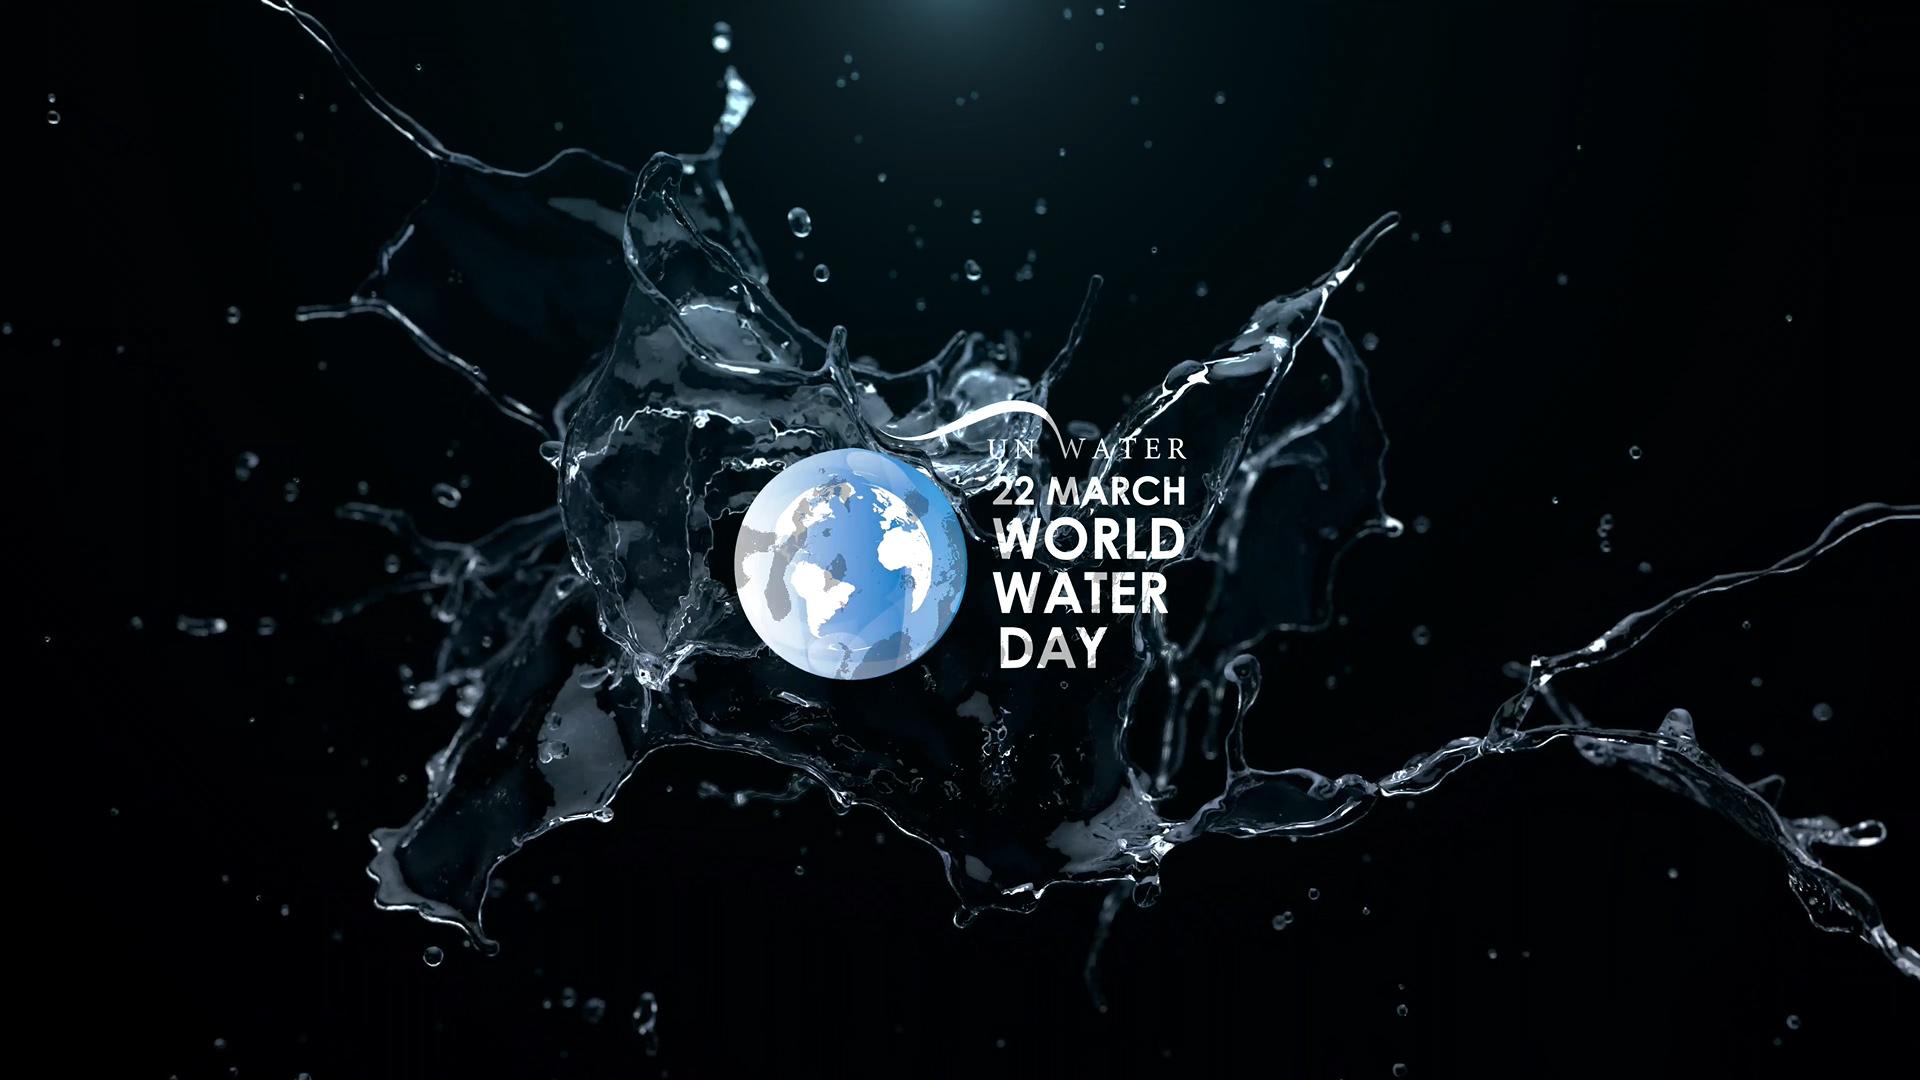 world-water-day-superlit-22-march